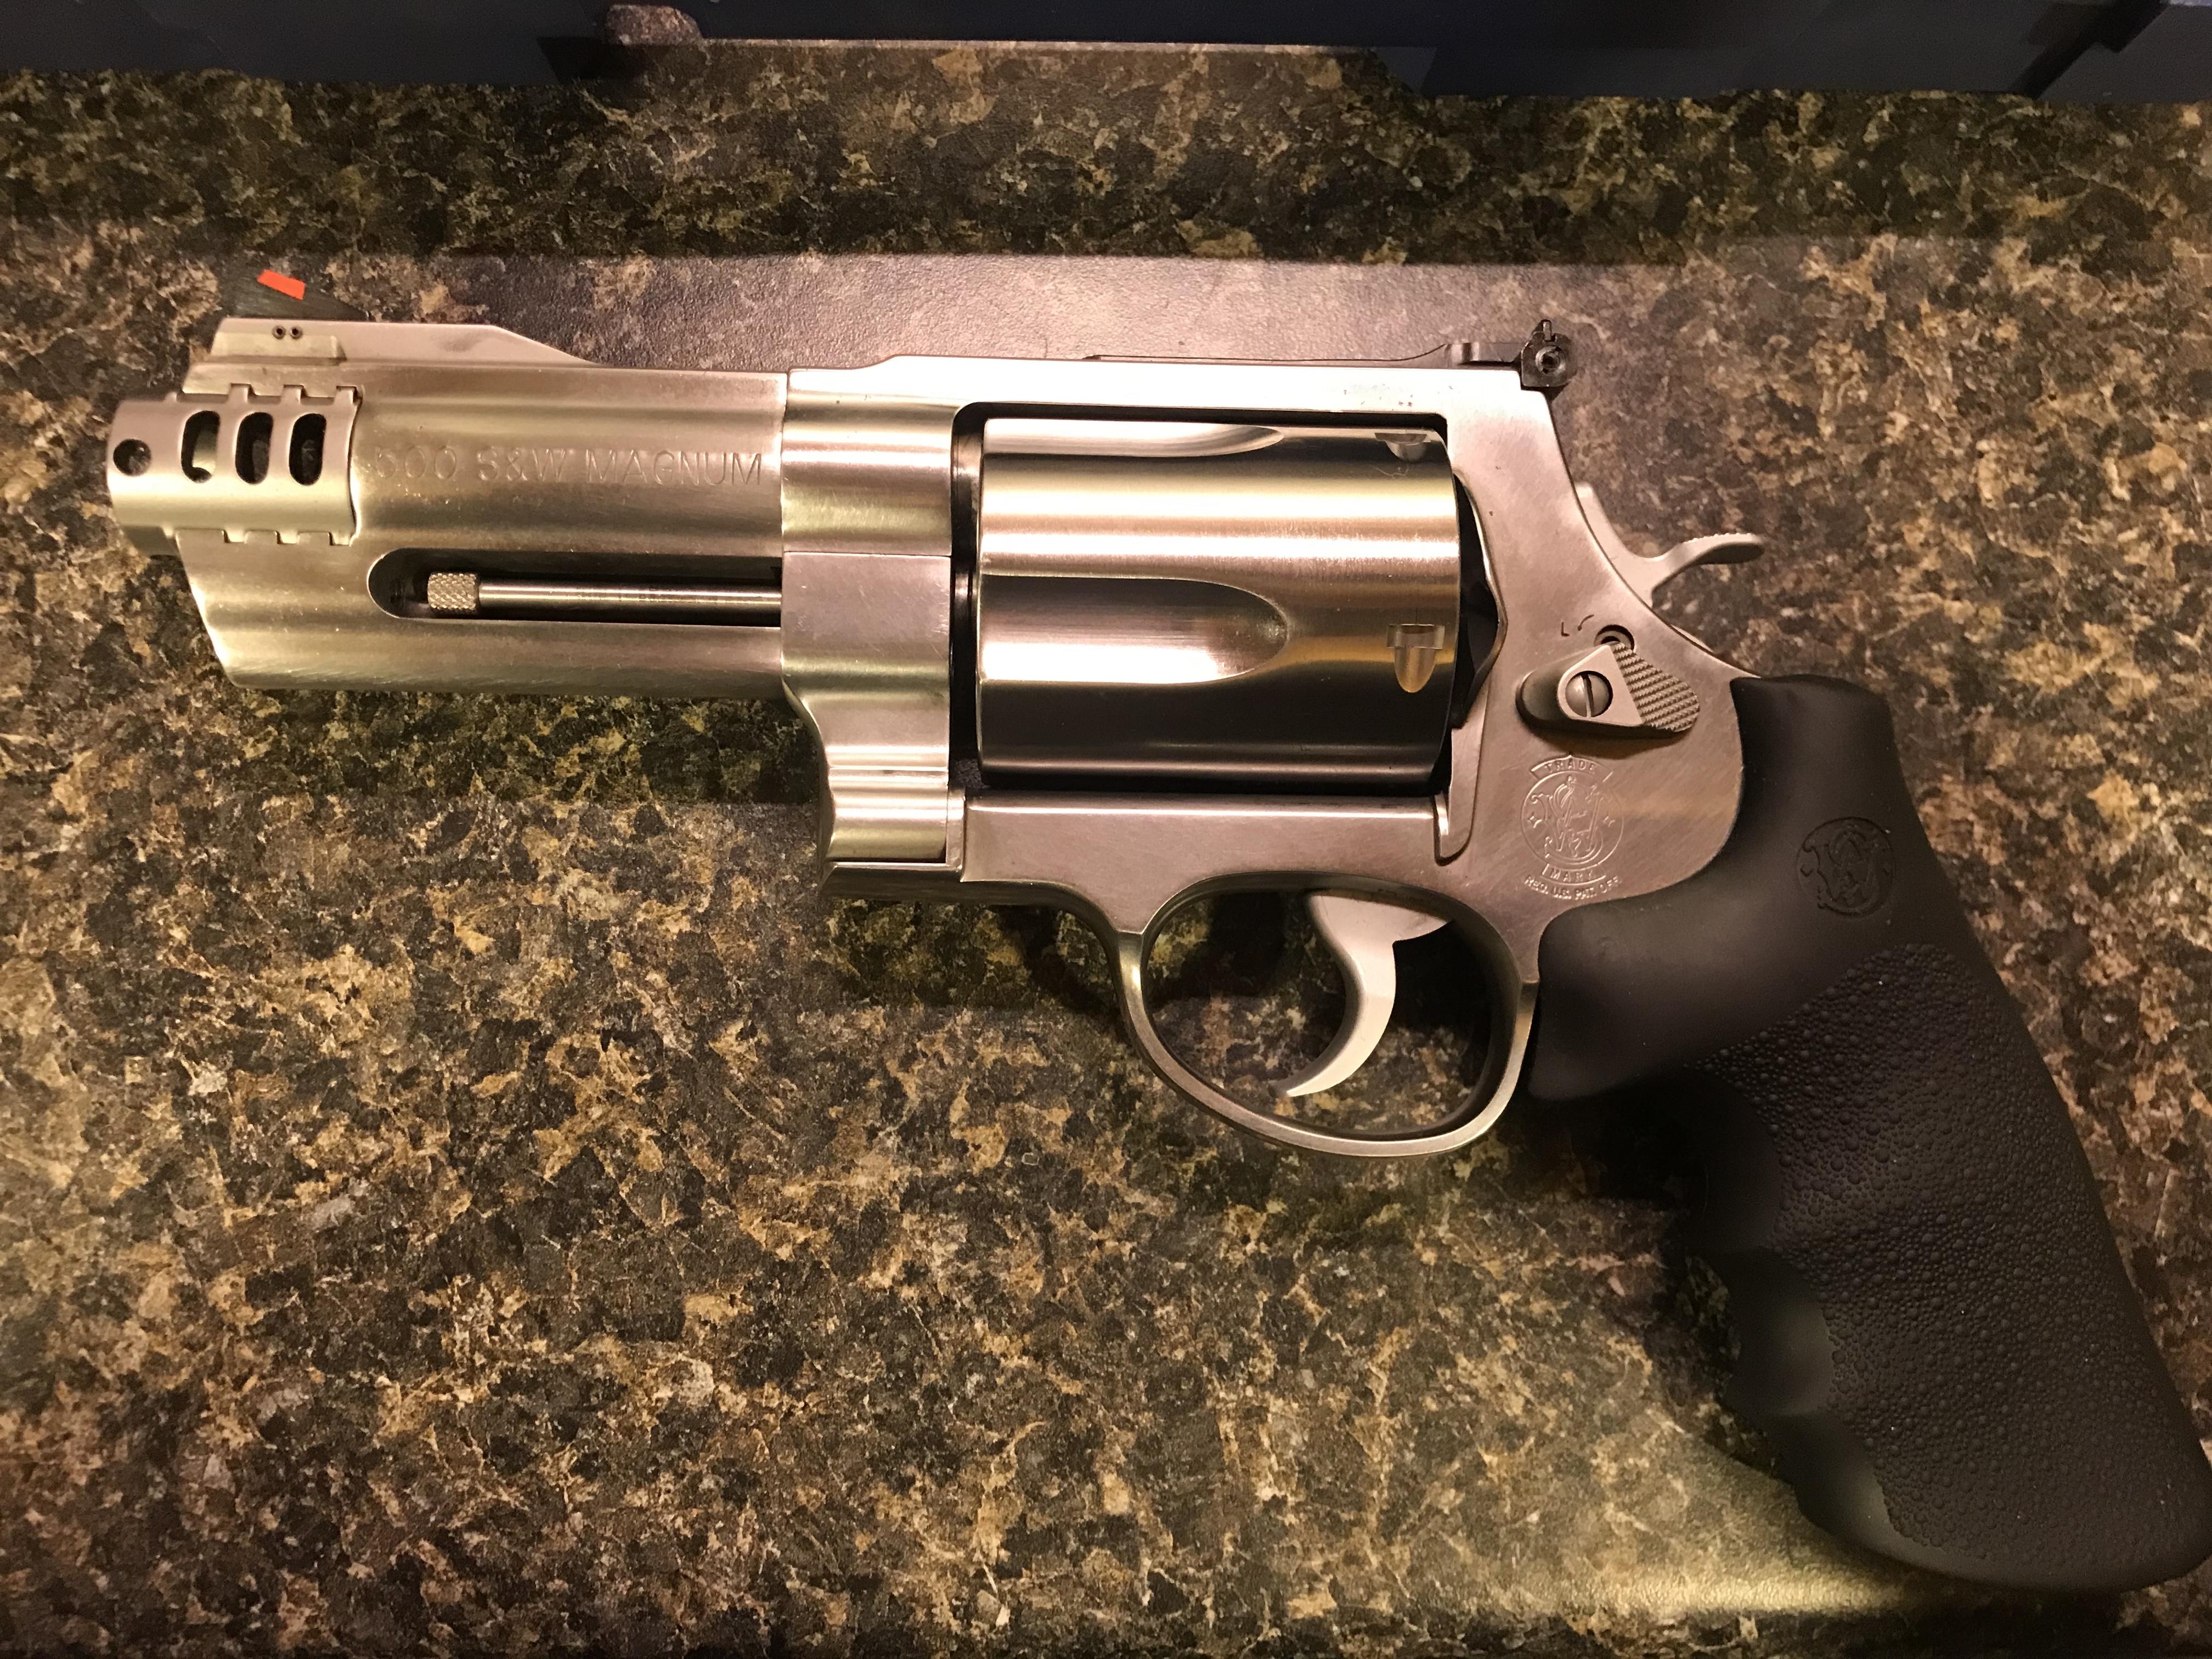 WTS:  S&W 500 Stainless Revolver-b84e1d38-9b10-427c-b2ed-beaca7a30517.jpeg